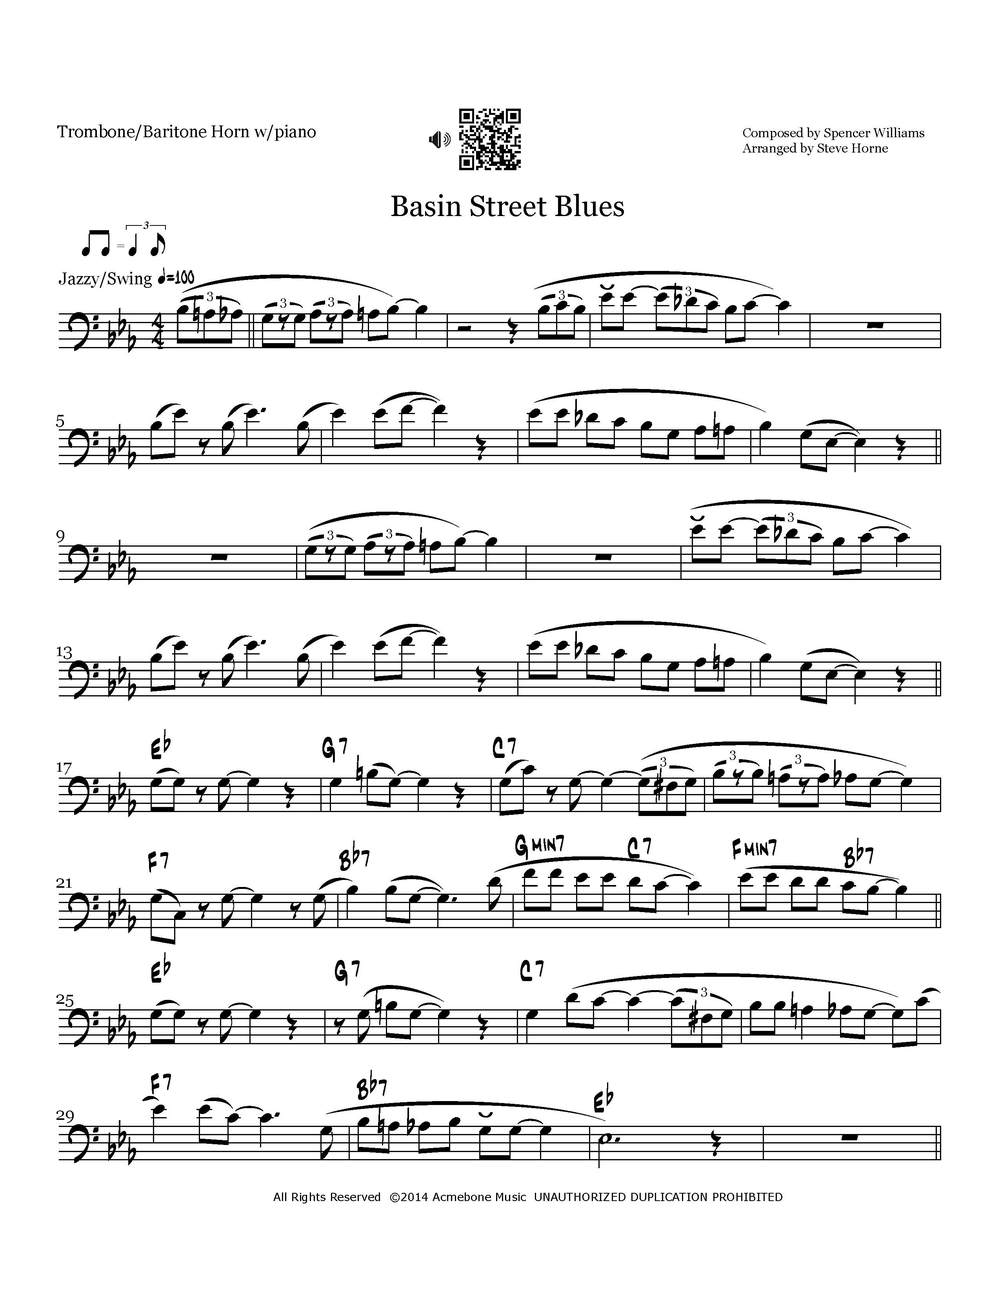 Basin Street Blues_download_from_acmebone.com_Page_2.jpg